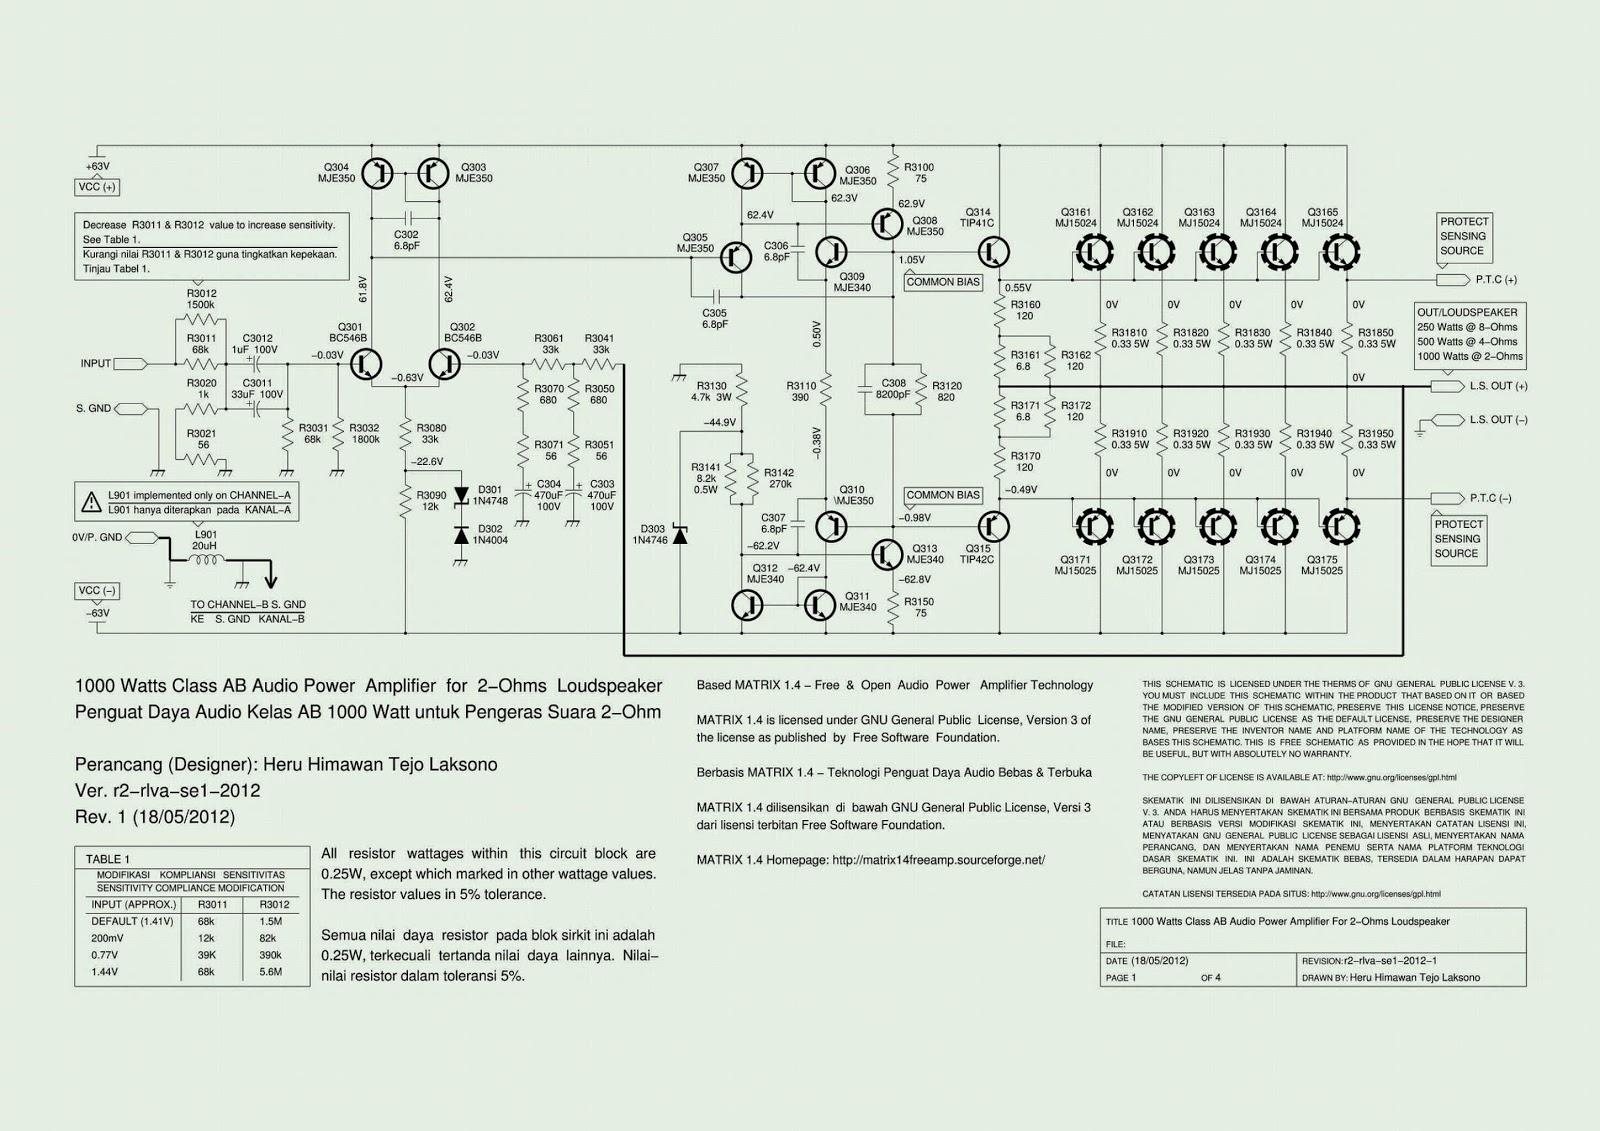 Anang Electronic Matrix 1 4 Watt 2ohm R2 Rlva Se 1